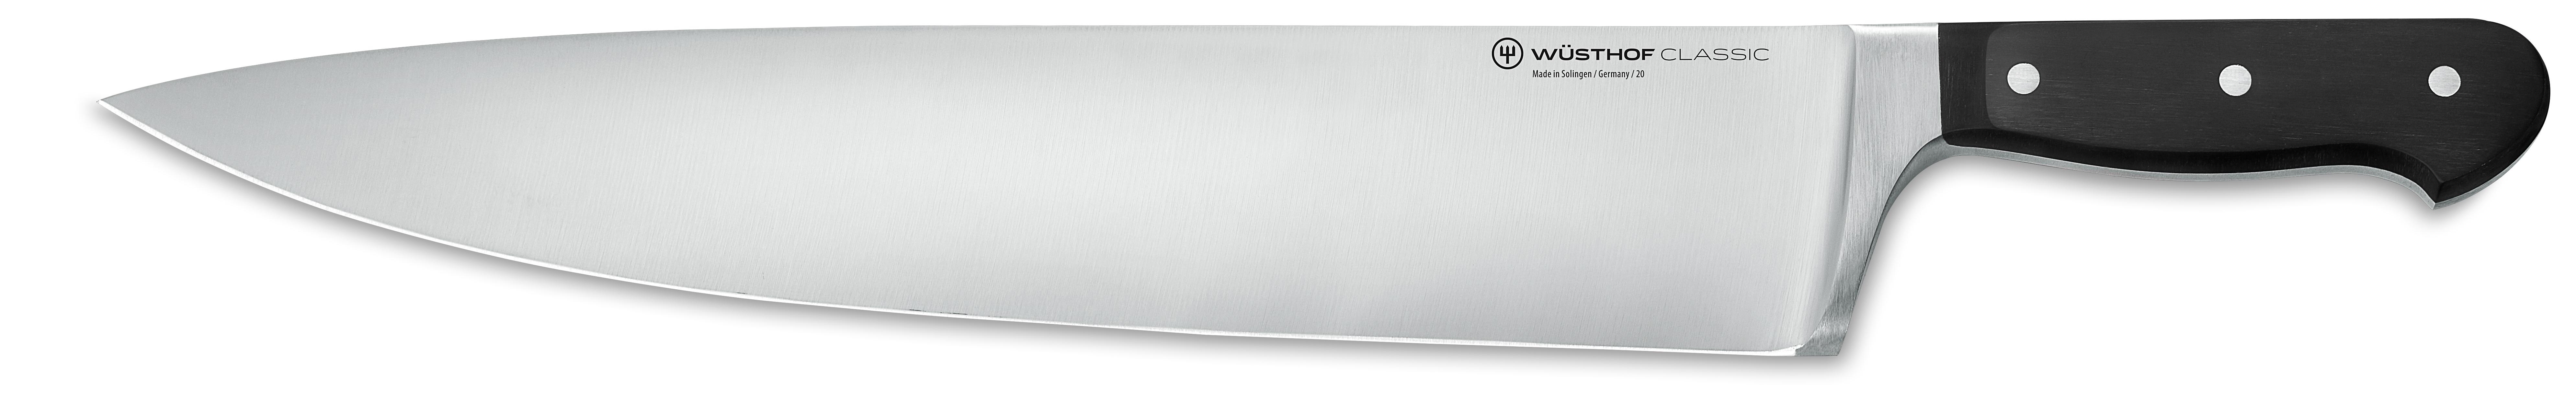 Kochmesser / Cook's knife